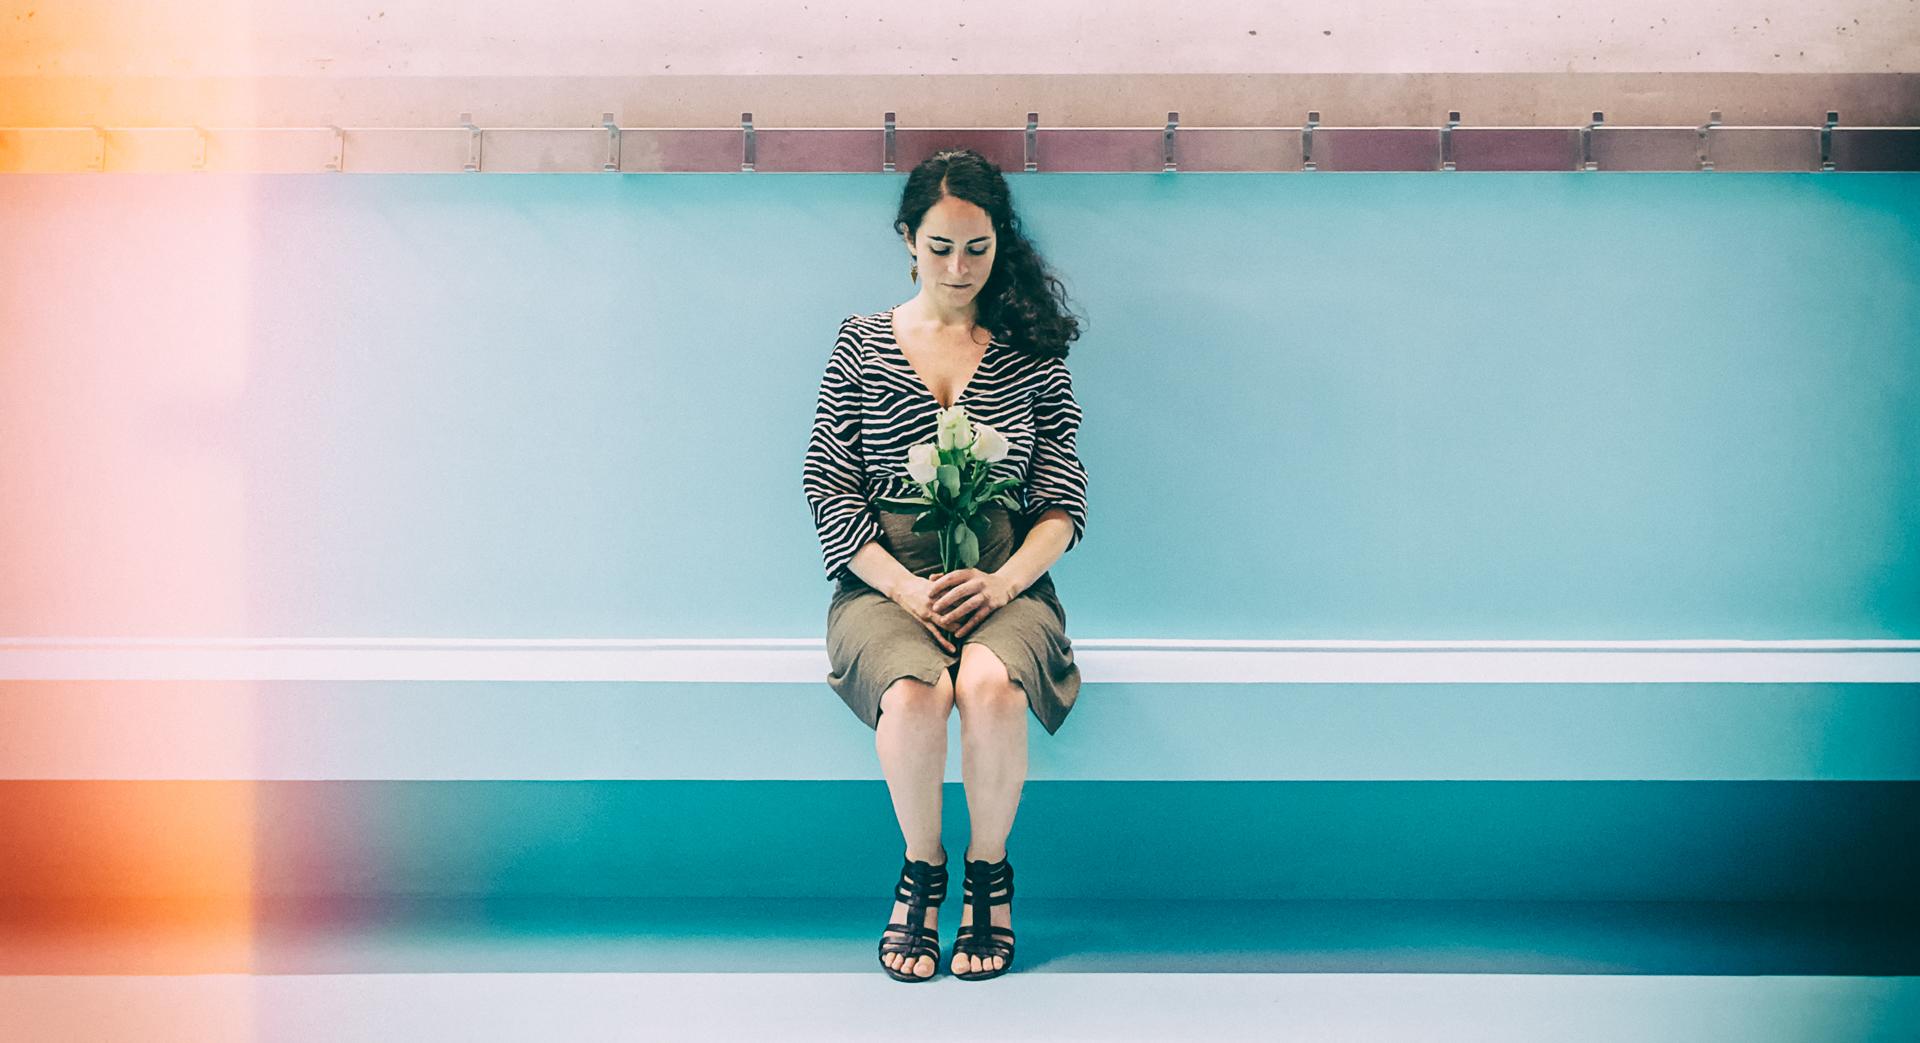 Aurélie Emery 2019